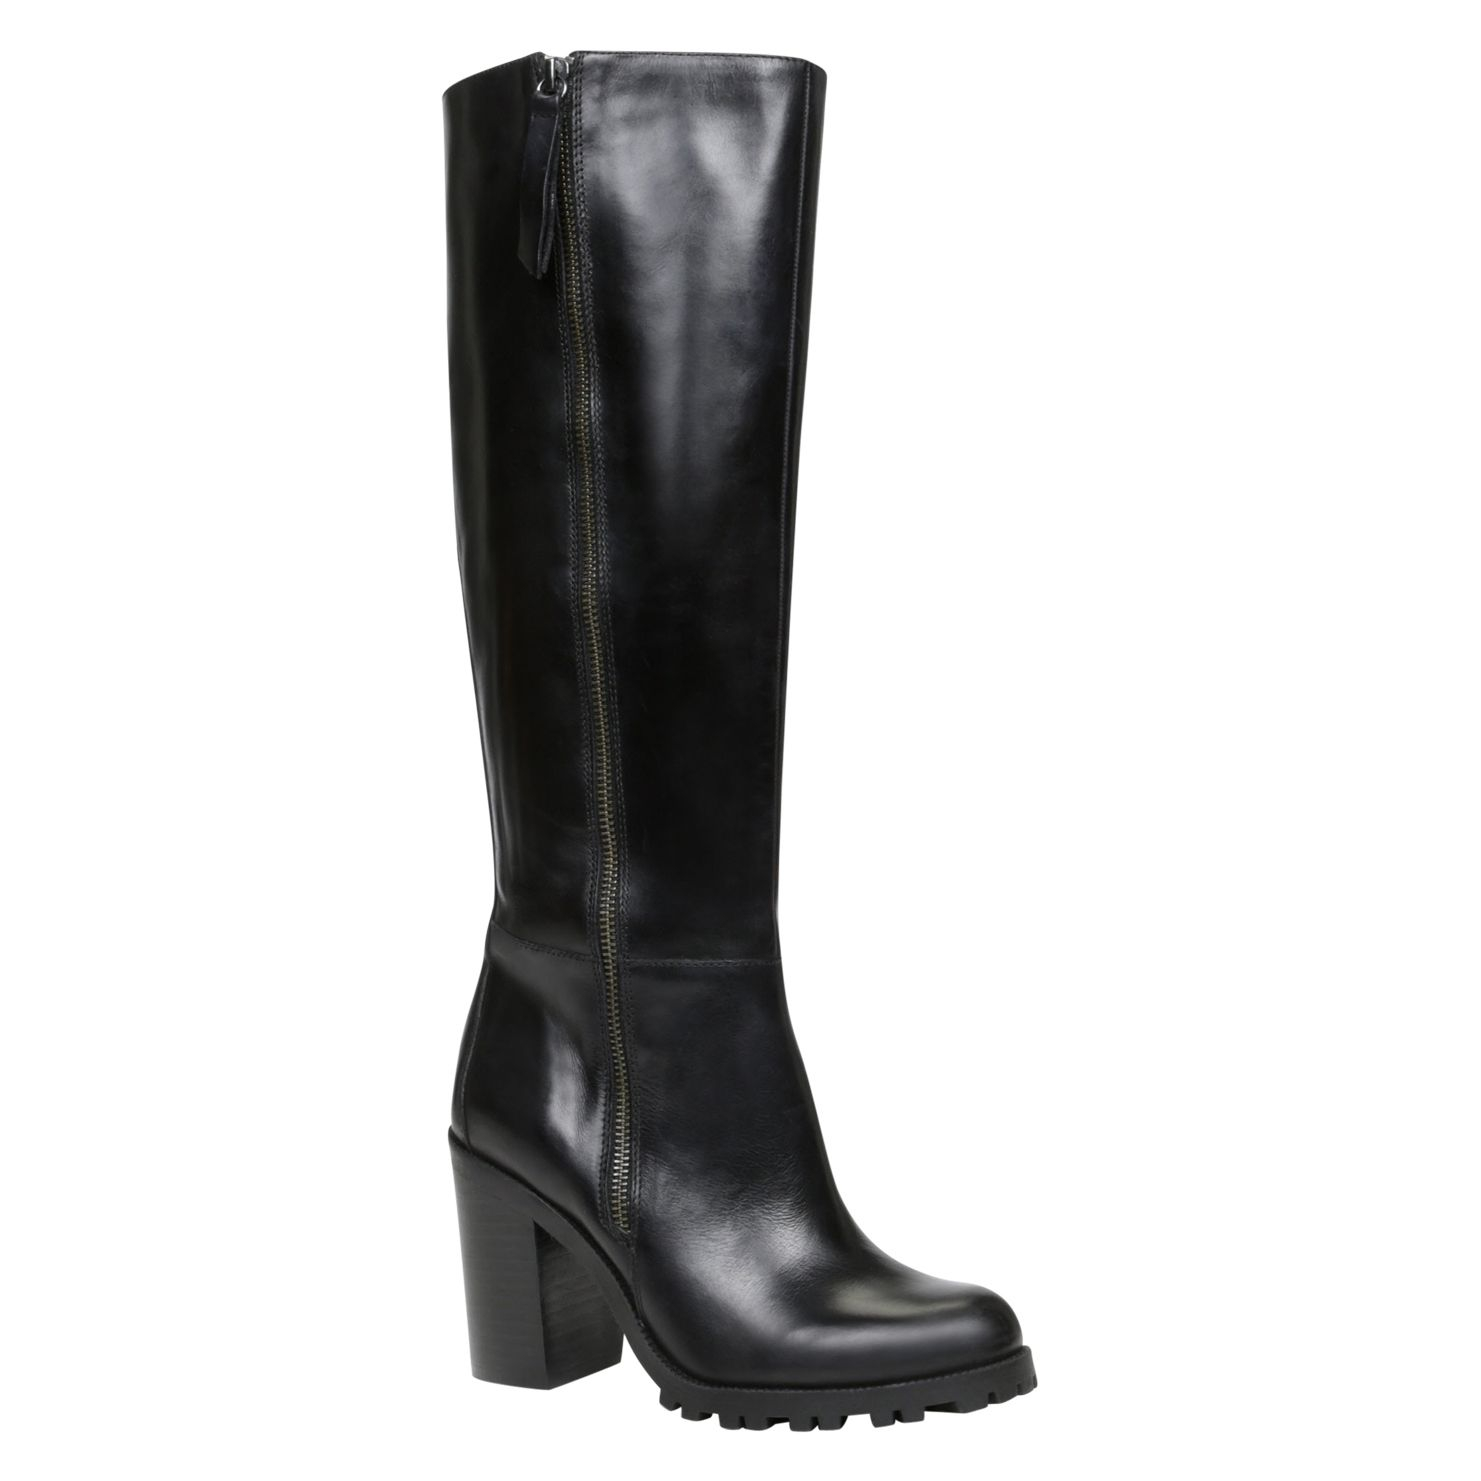 ALDO Leather Ulelavia in Black